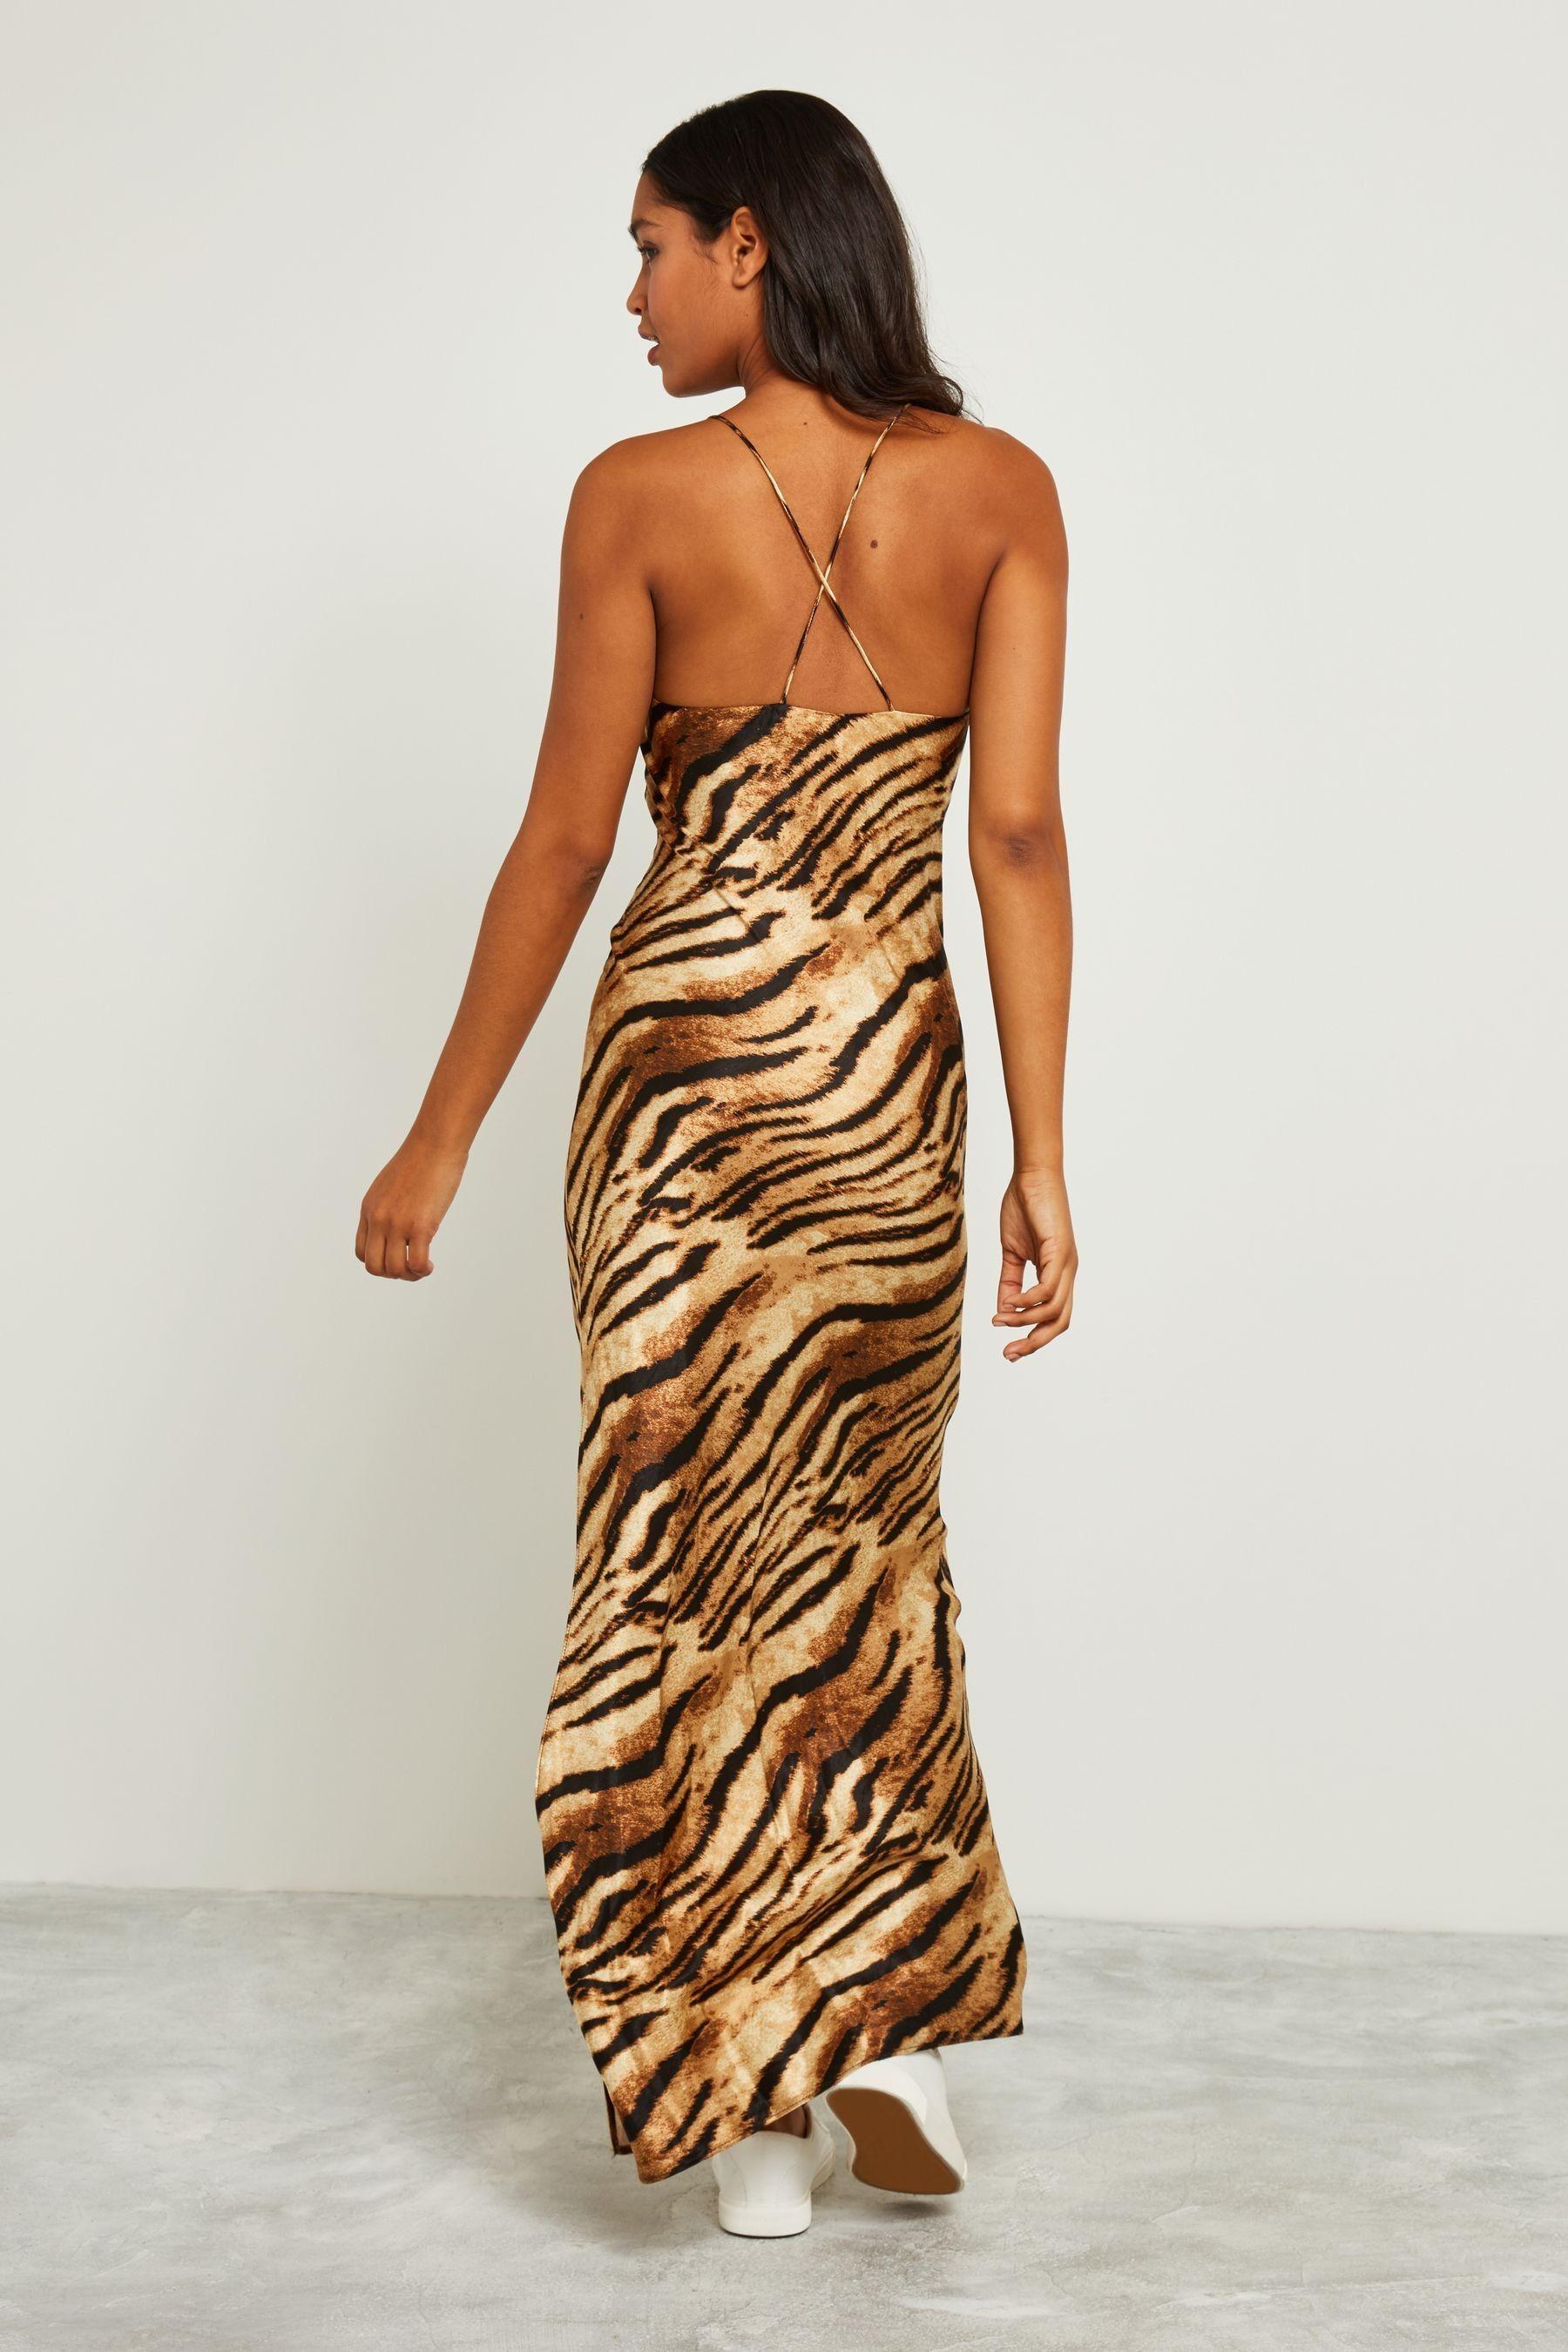 Buy F F Multi Tiger Strappy Maxi Dress From The Next Uk Online Shop Strappy Maxi Dress Maxi Dress Dresses [ 2700 x 1800 Pixel ]